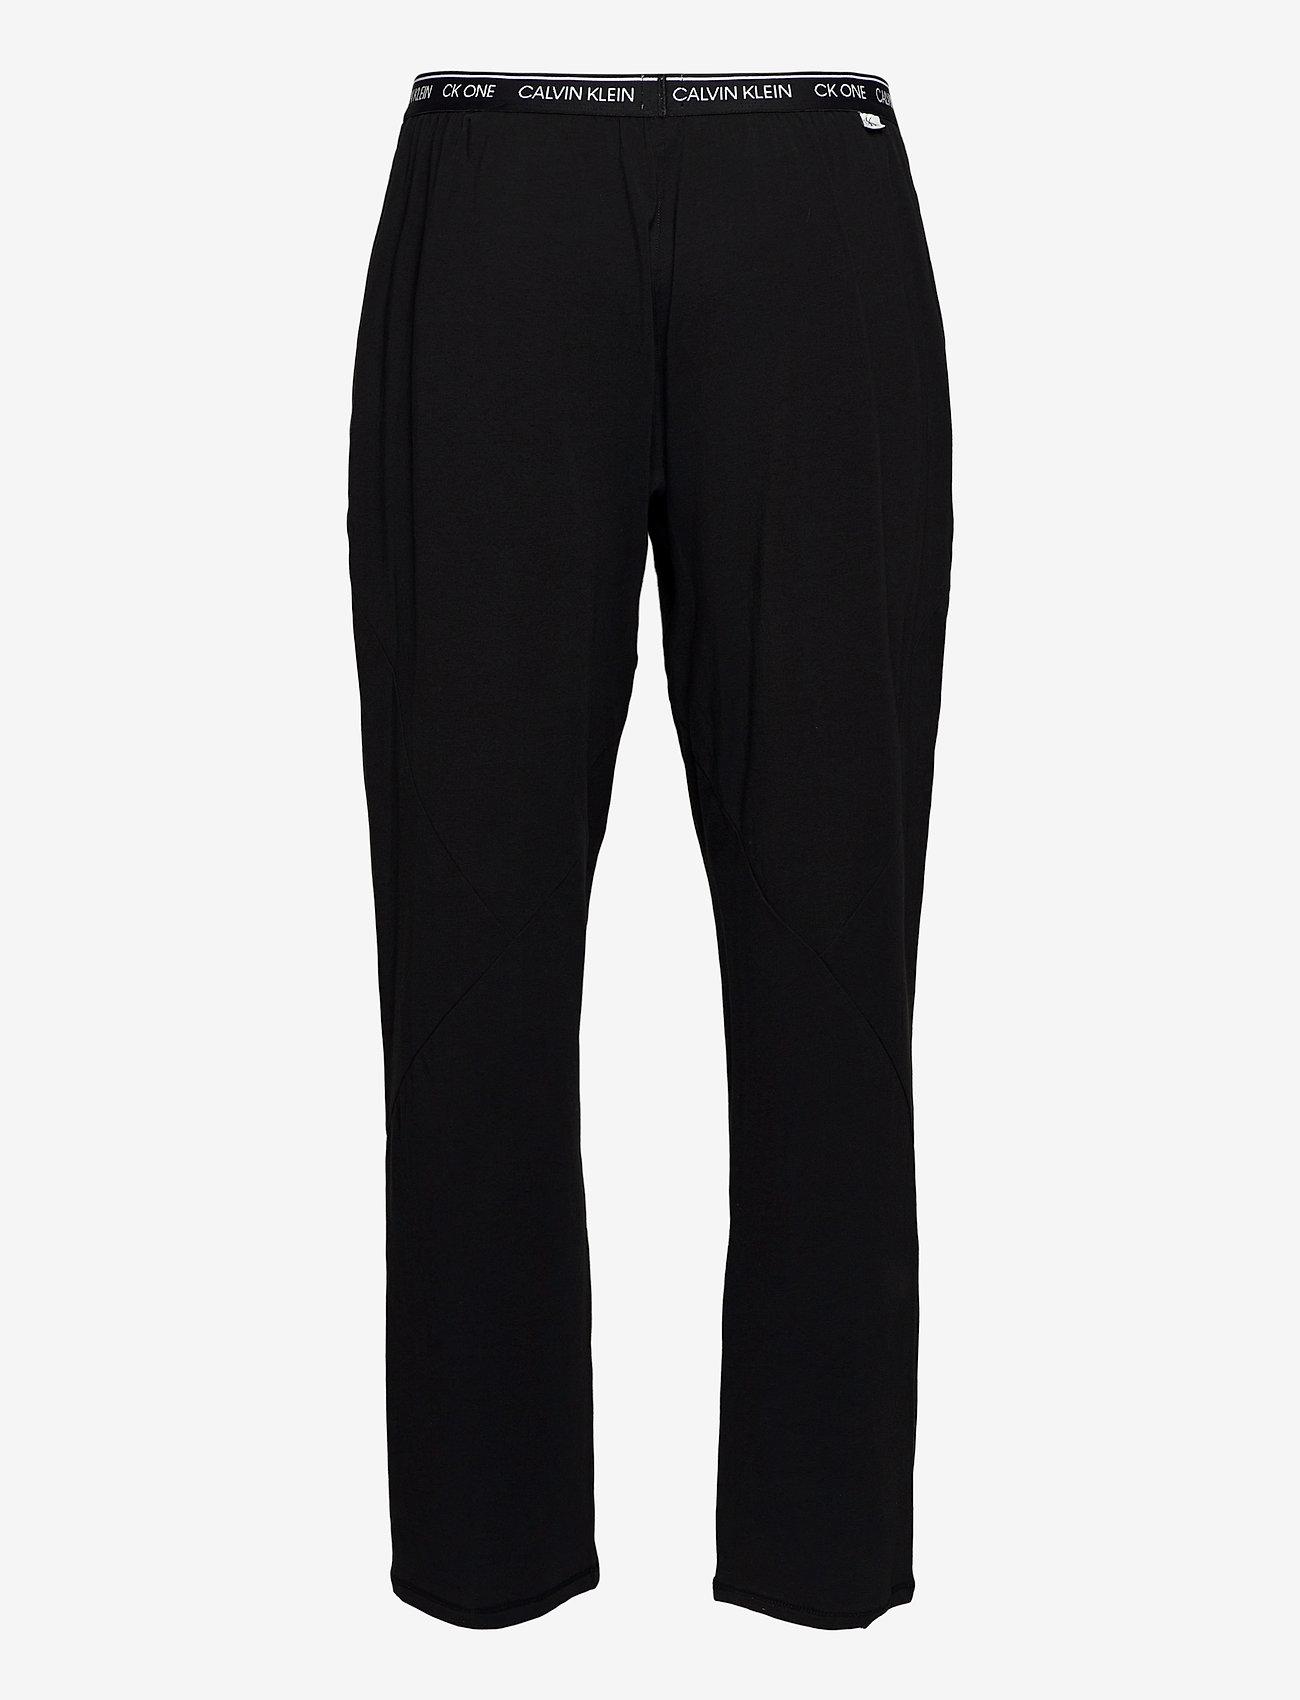 Calvin Klein - SLEEP PANT - bottoms - black - 1